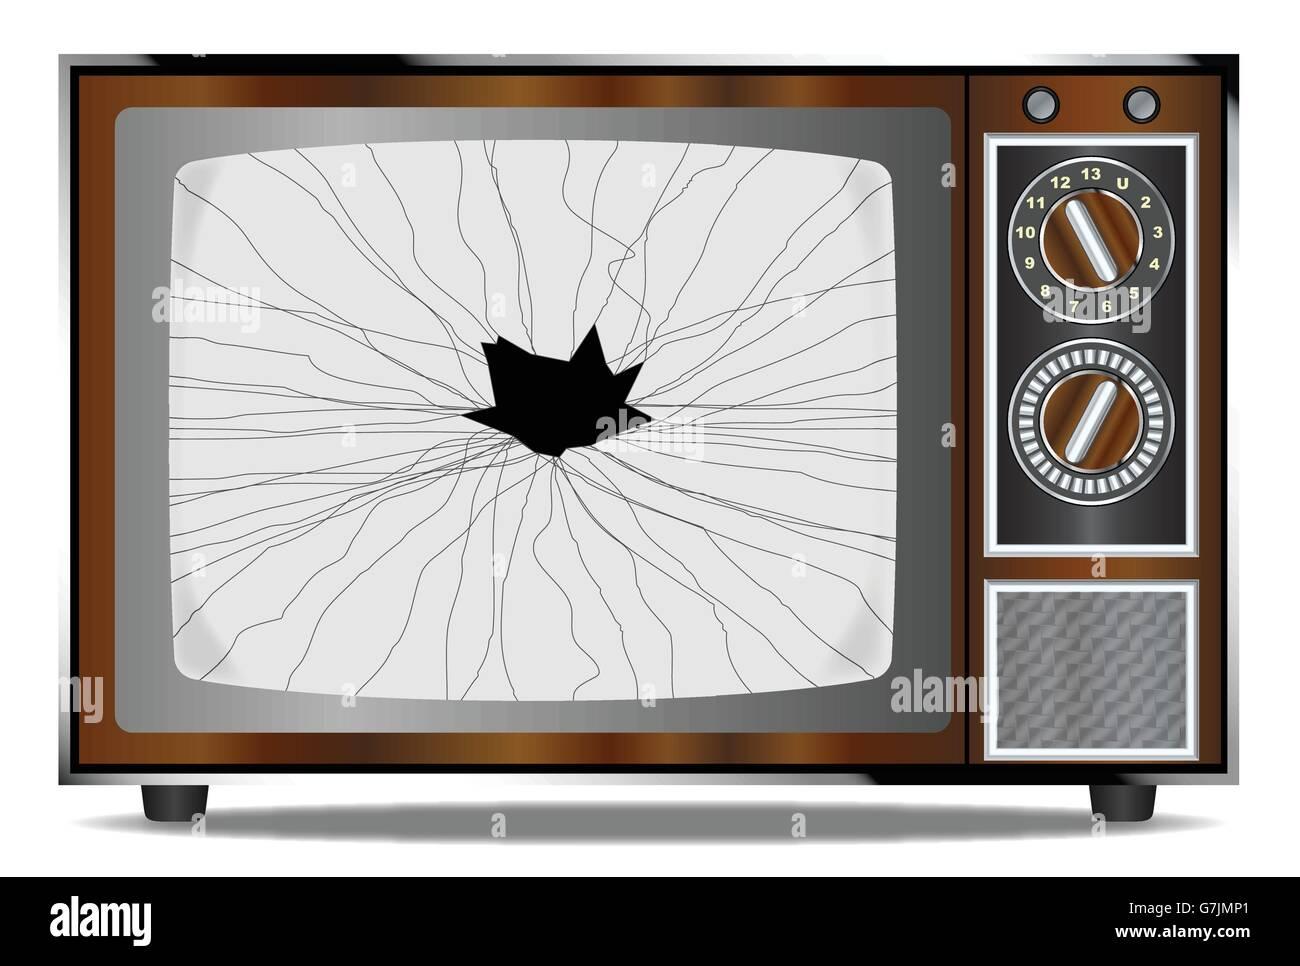 Smashed Television Screen Stock Photos Amp Smashed